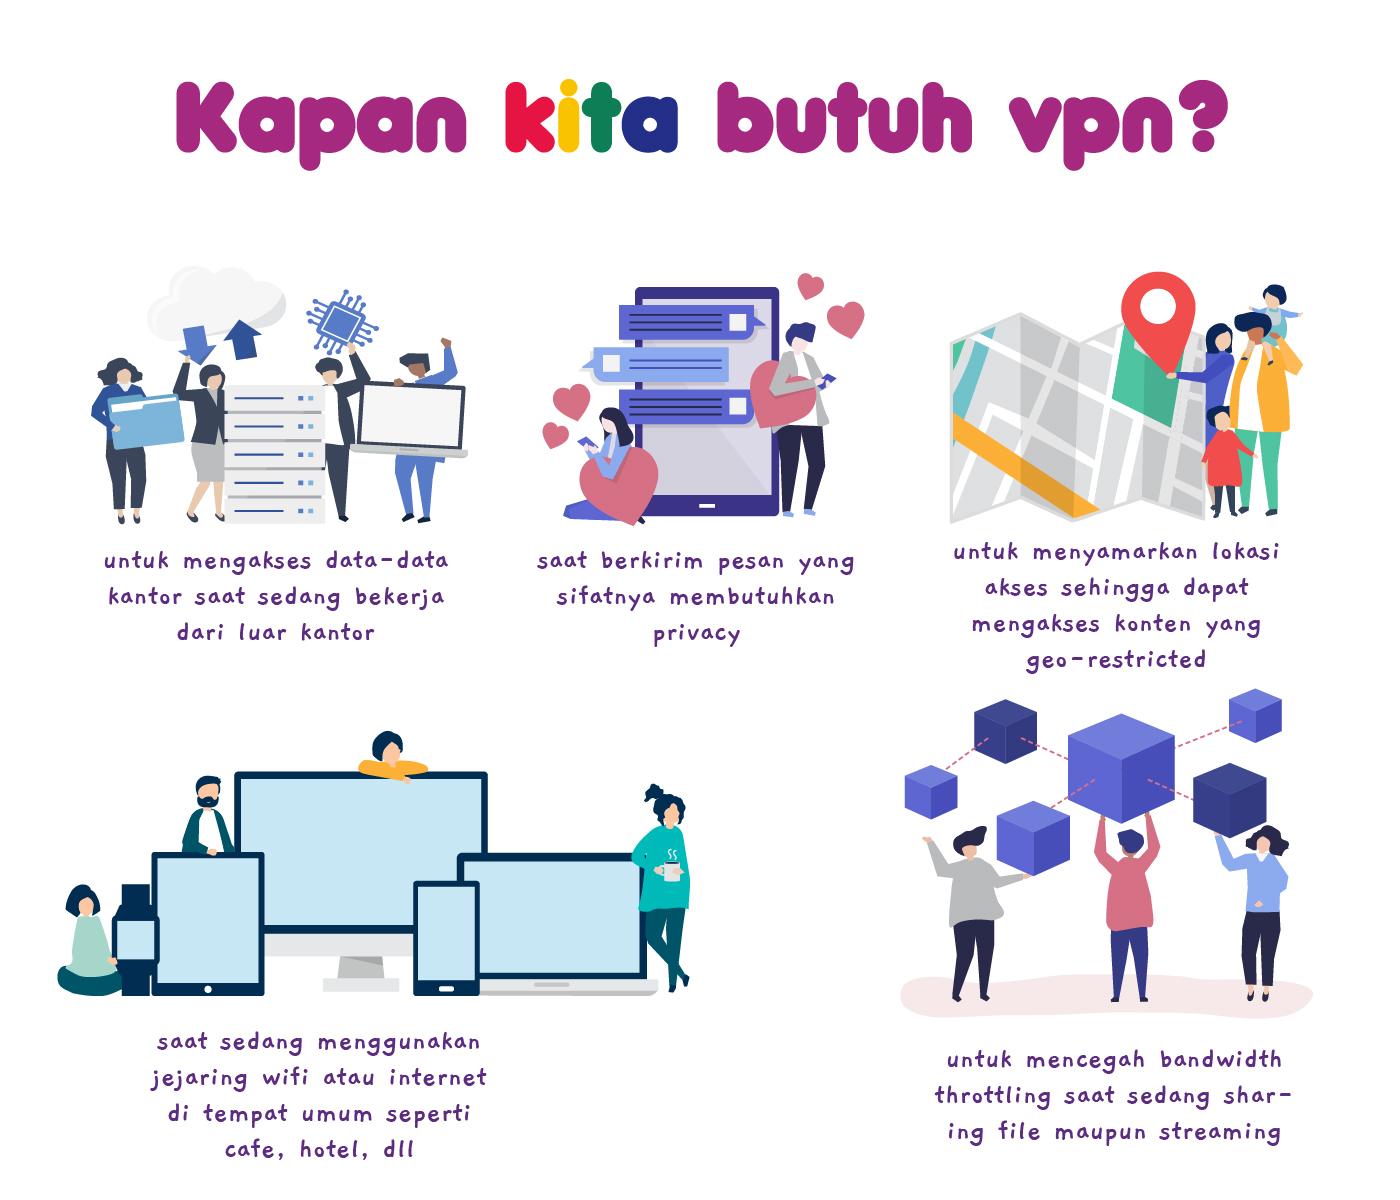 vpn-infographic